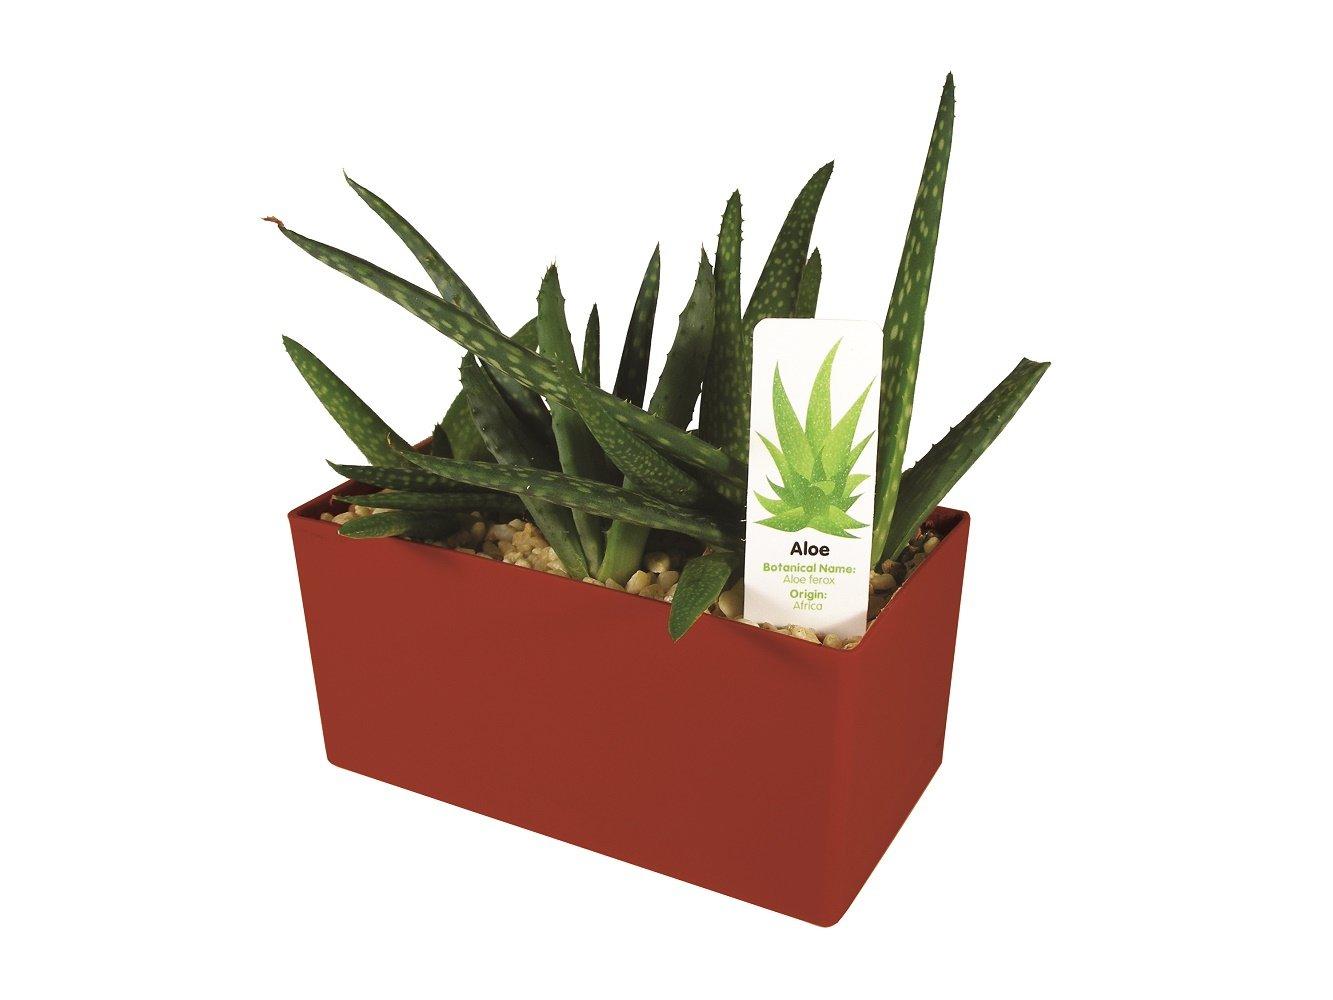 DuneCraft PW-0110 Indespensible Aloe